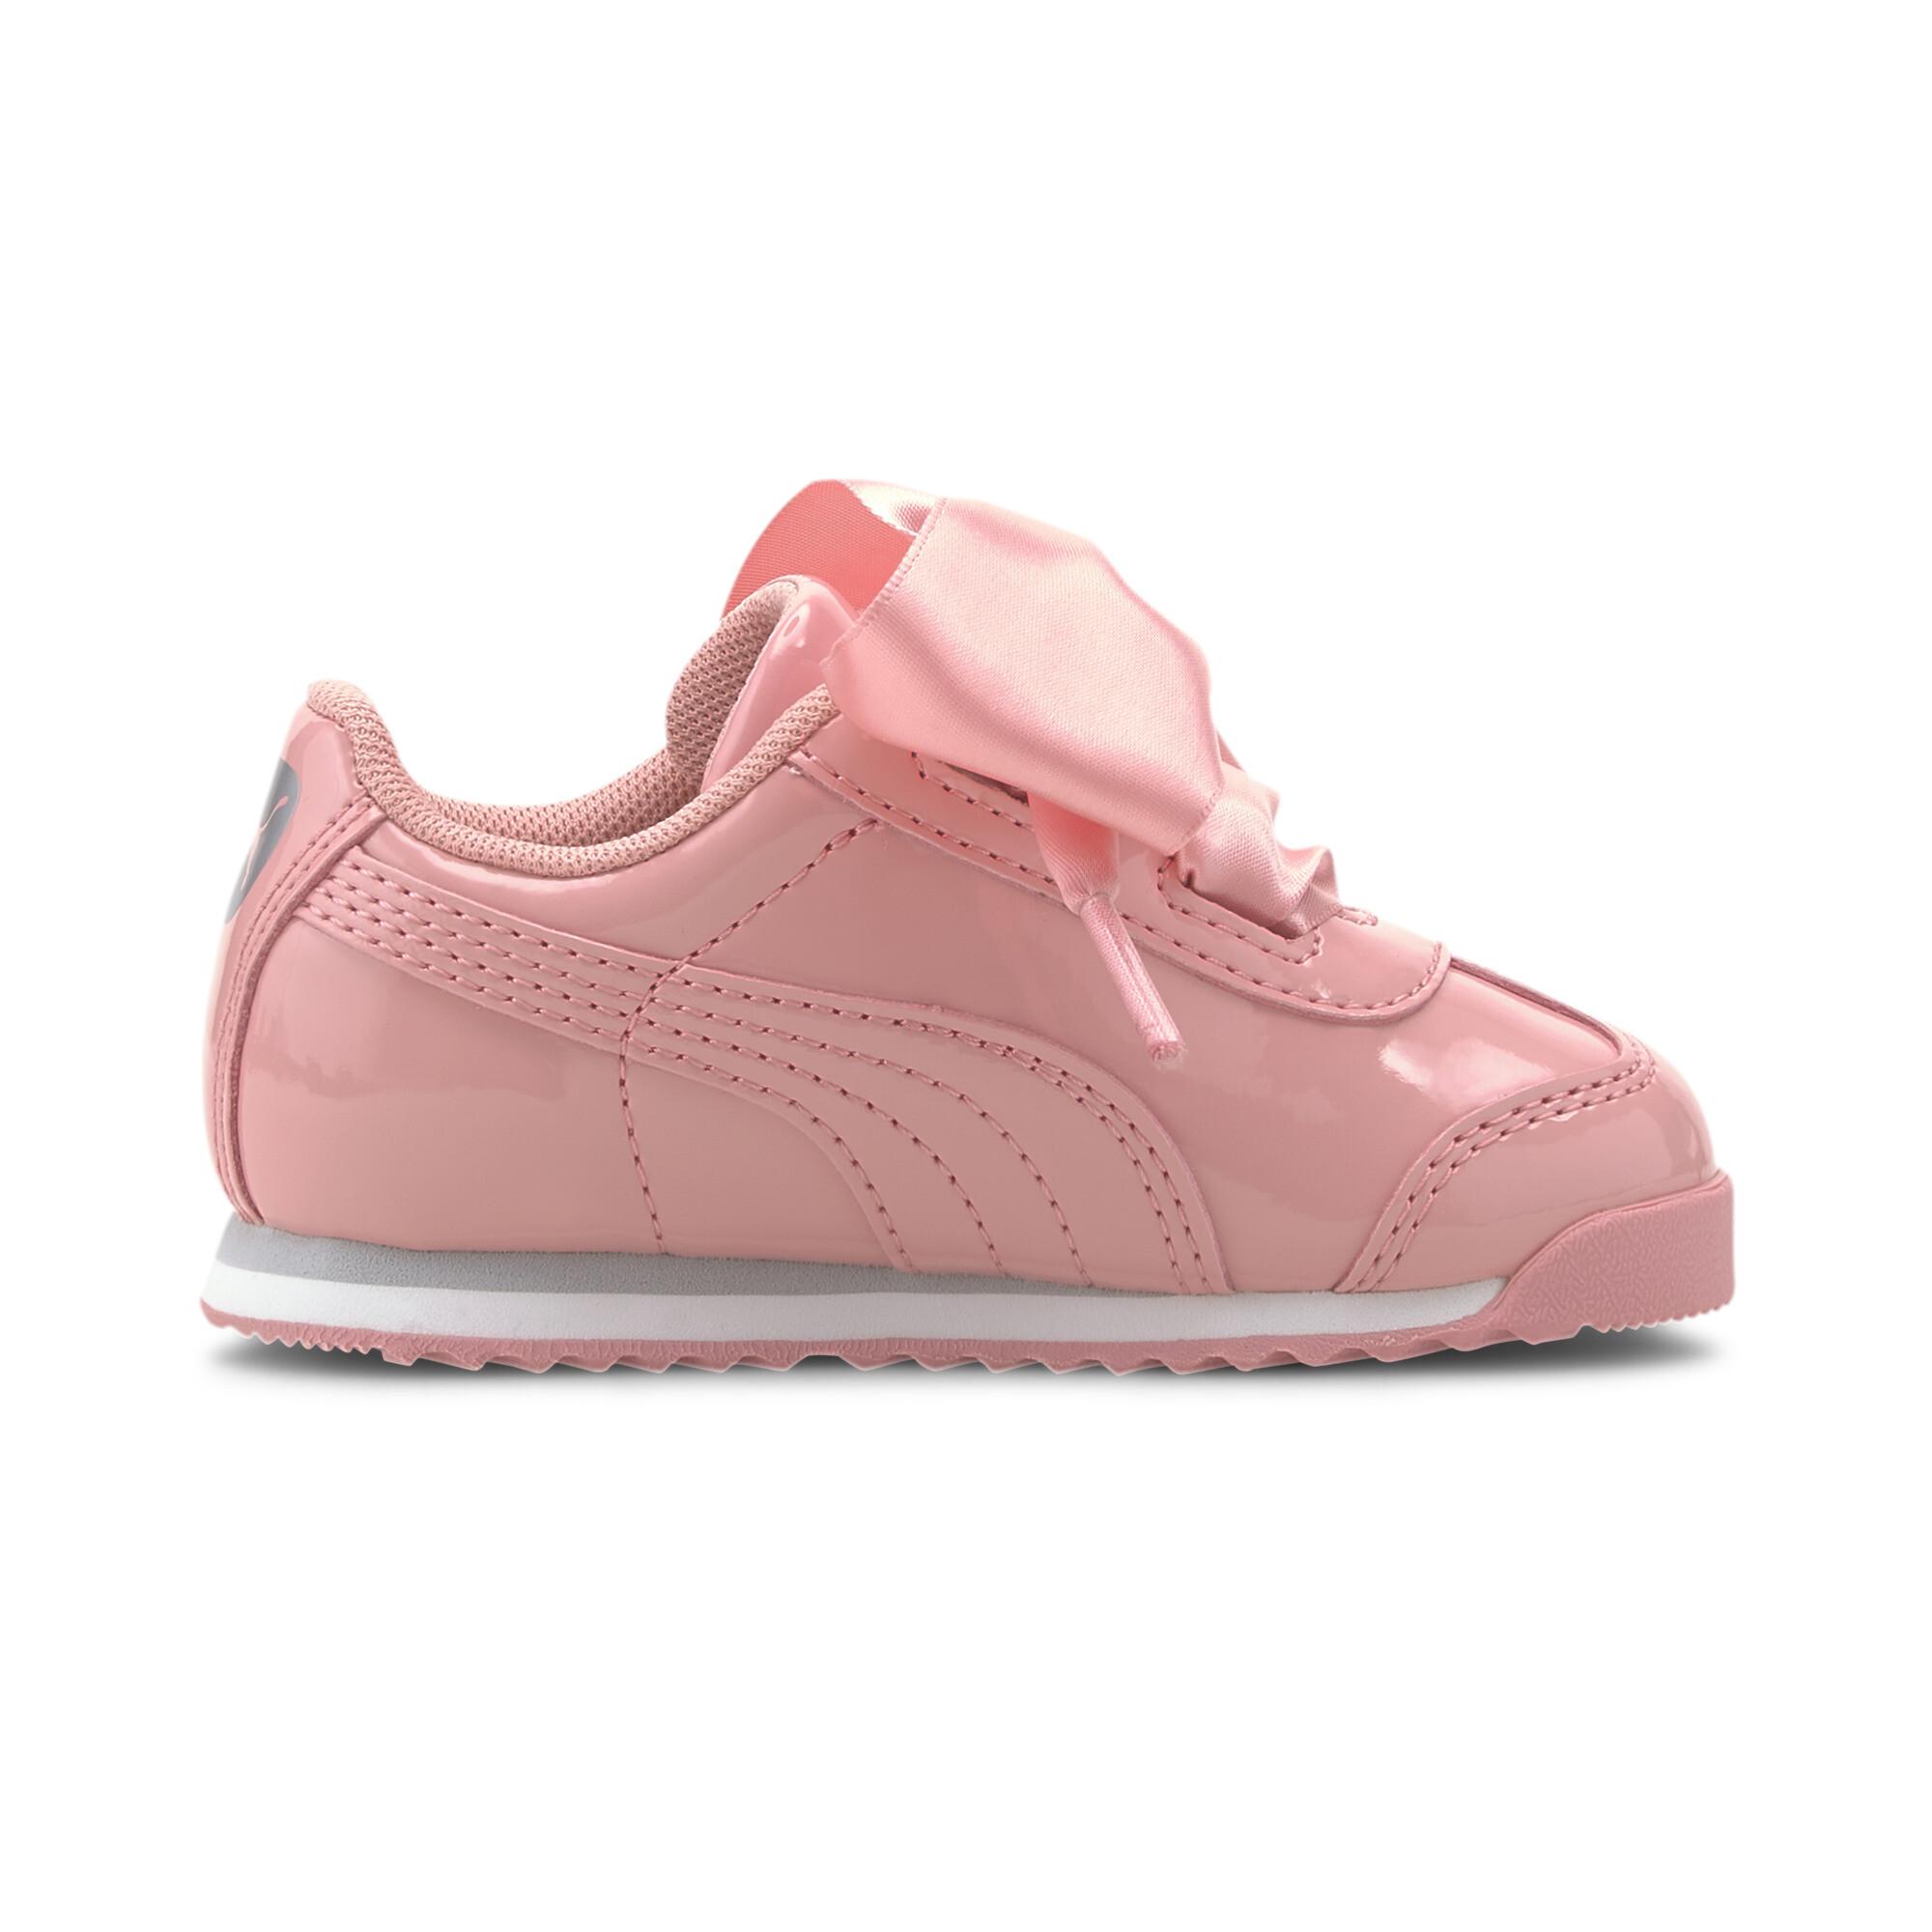 PUMA-Roma-Heart-Patent-Toddler-Shoes-Girls-Shoe-Kids thumbnail 24